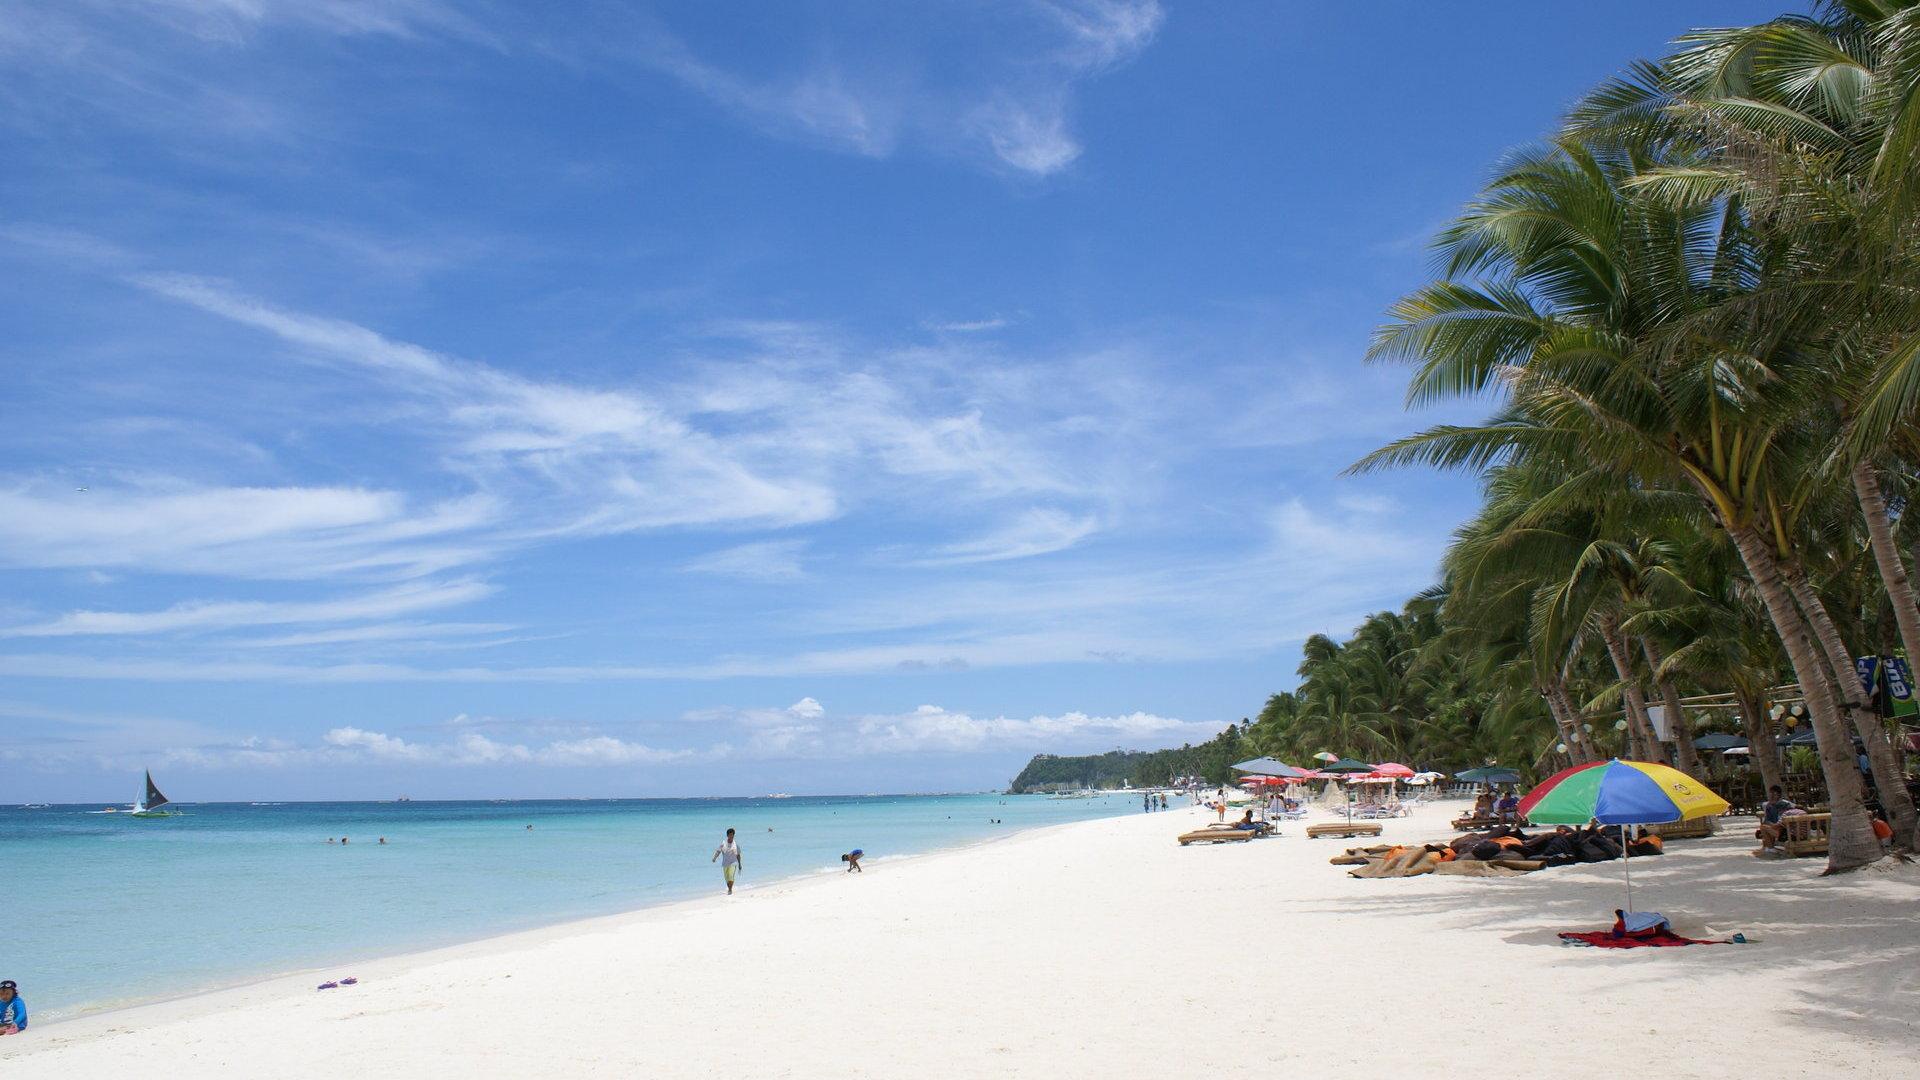 boracay beach hq wide - photo #1